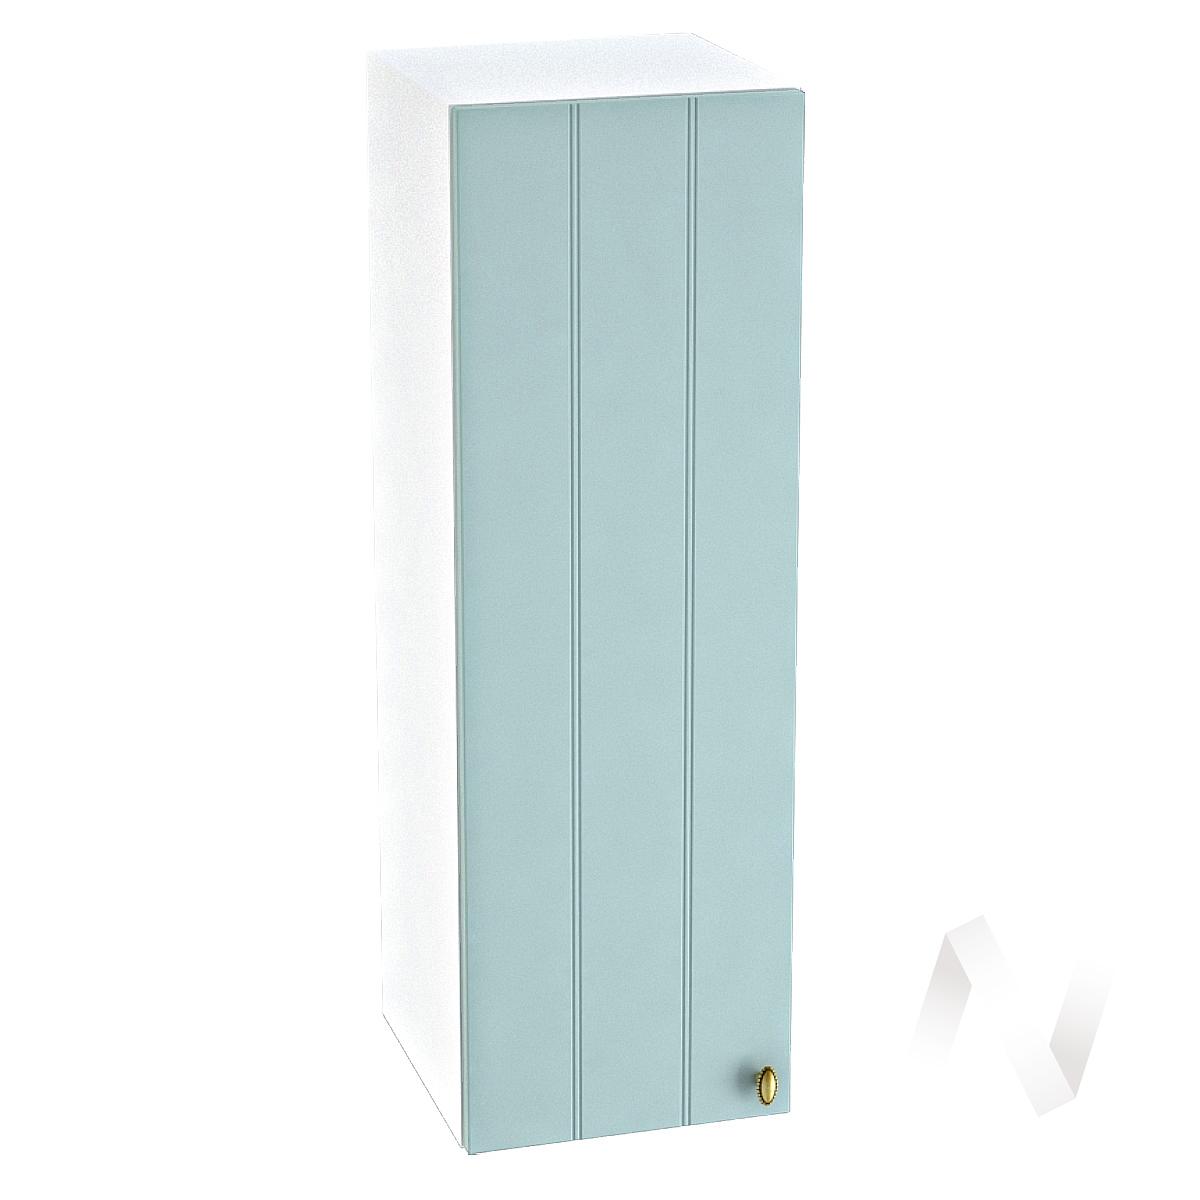 "Кухня ""Прованс"": Шкаф верхний 309, ШВ 309 (голубой/корпус белый)"